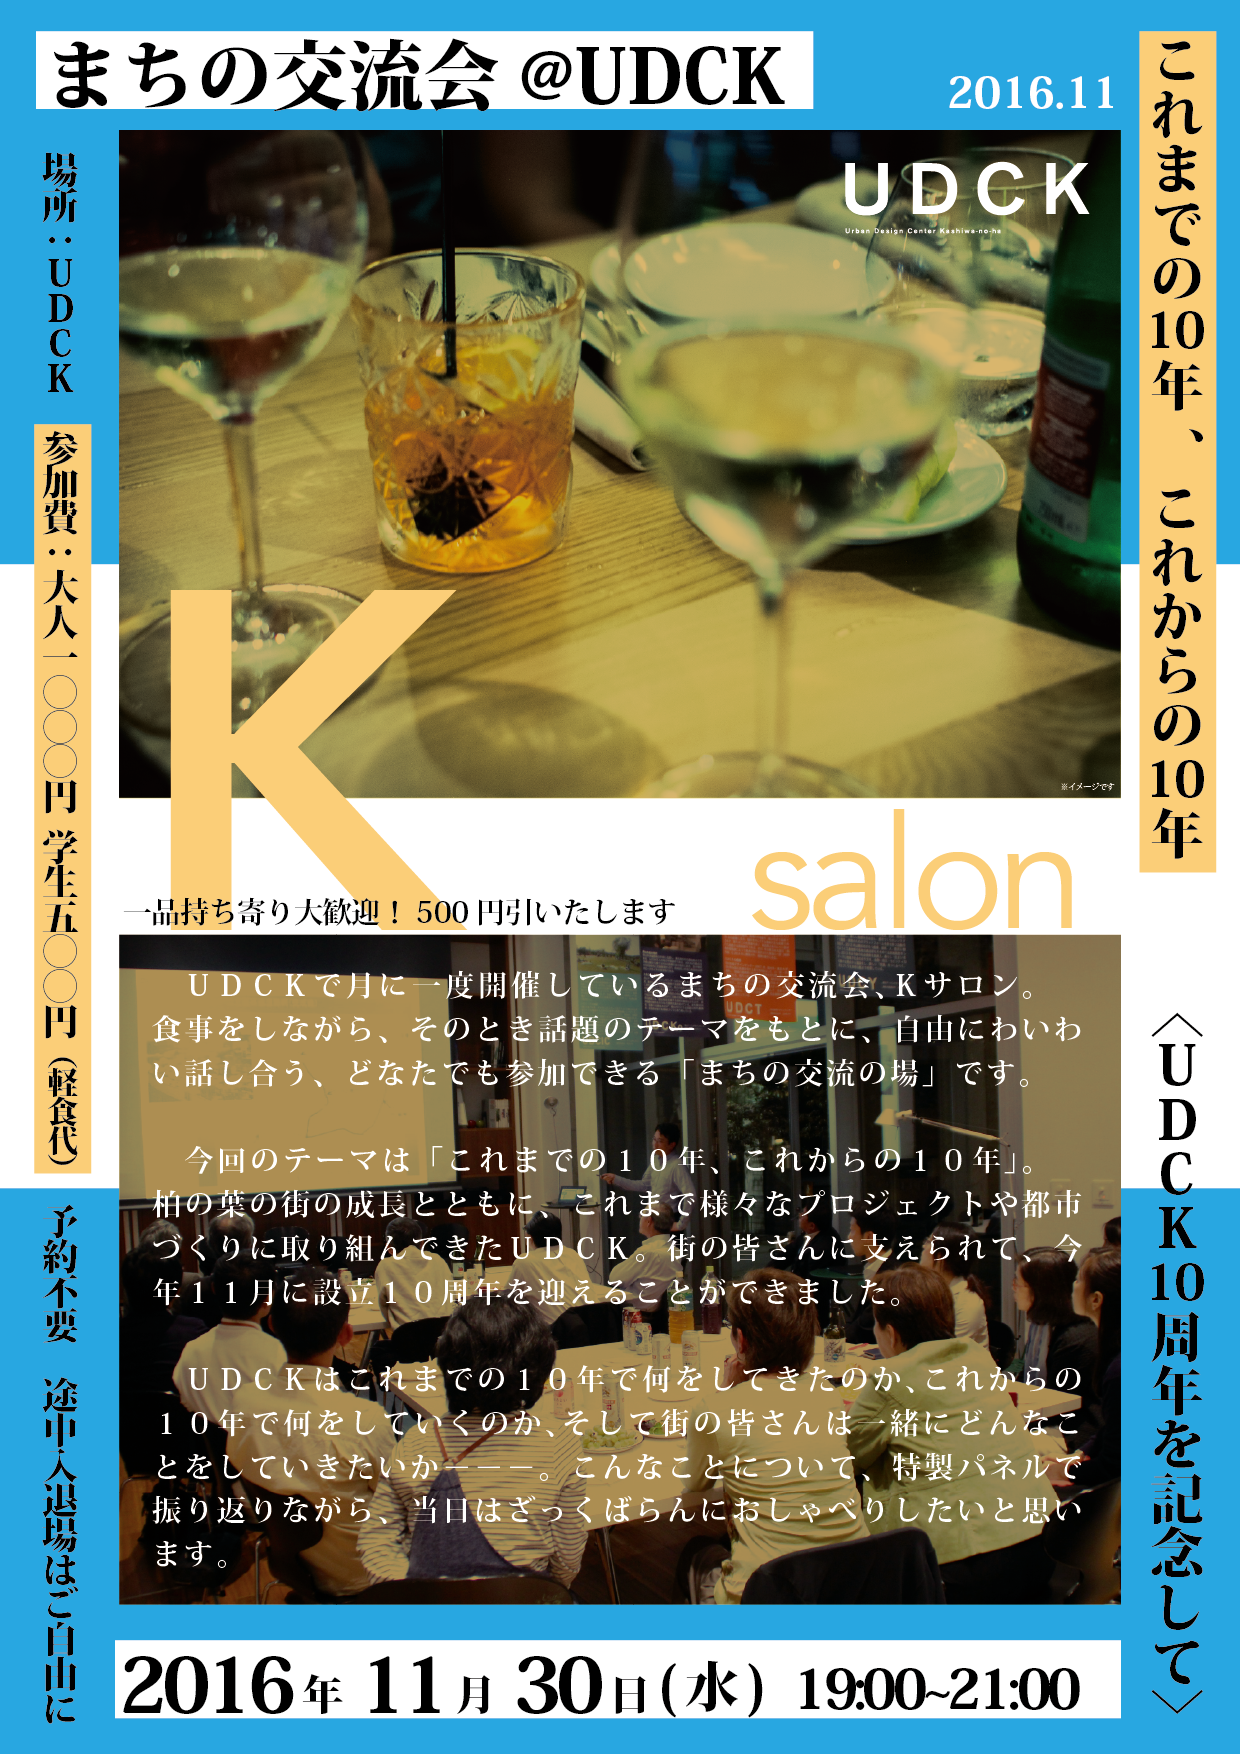 http://www.udck.jp/event/2016_11_Ksalon-01.png